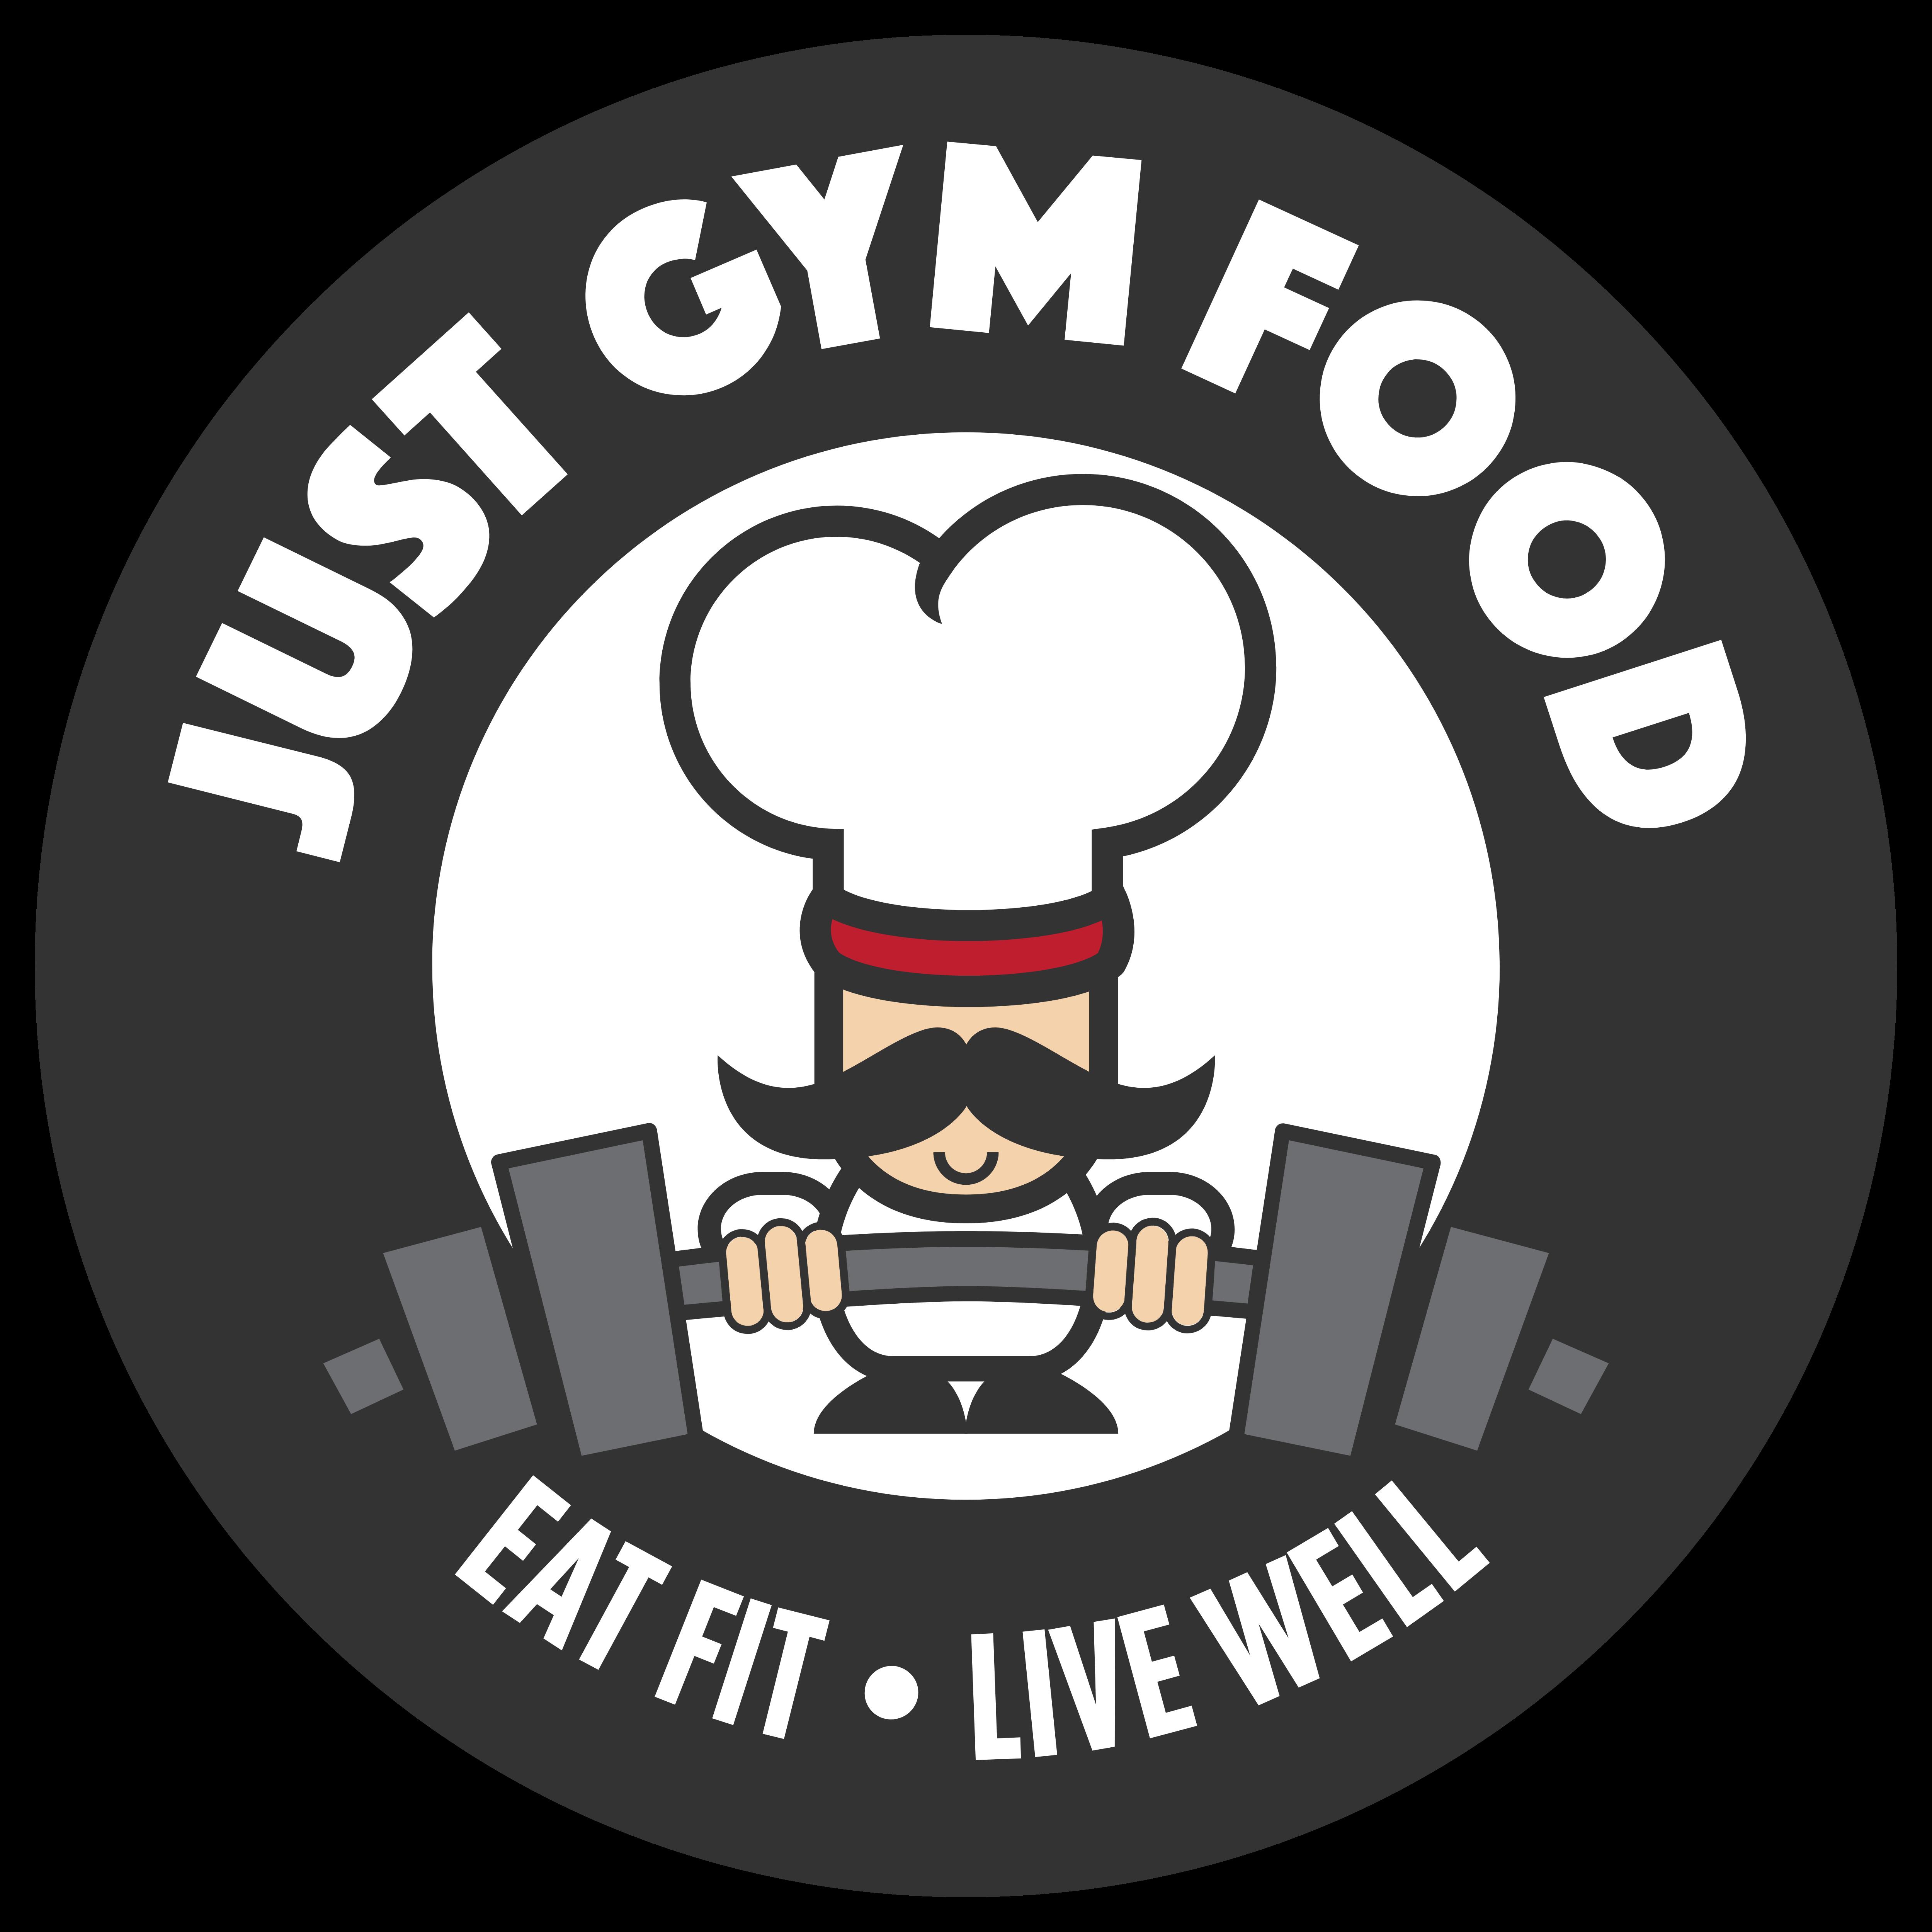 Gym clipart gym logo. Just food logos download